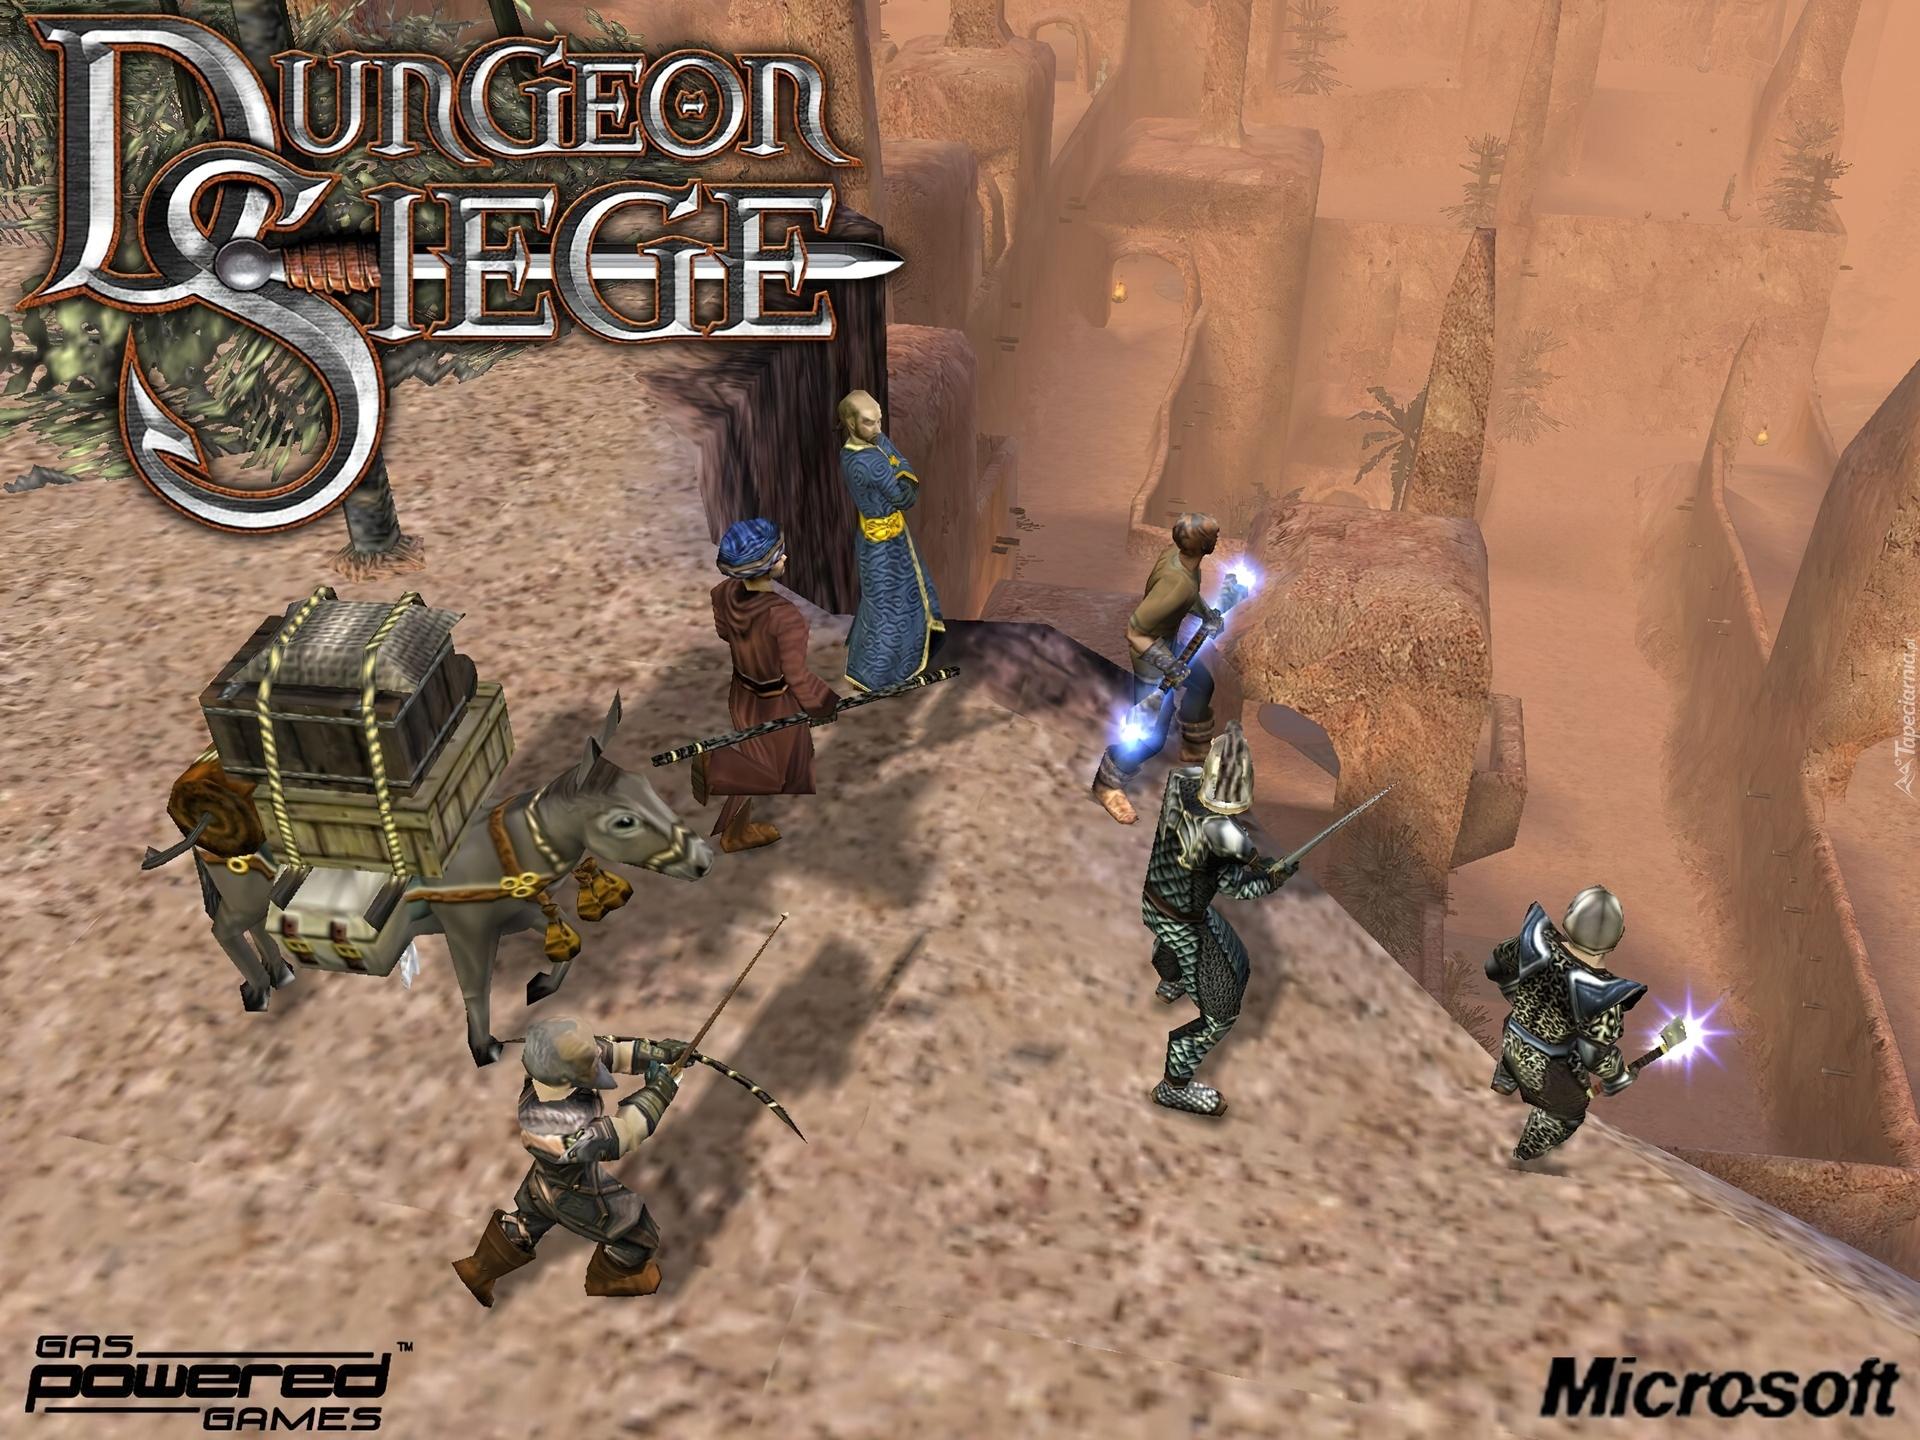 Dungeon SiegefromDiablogames Archives